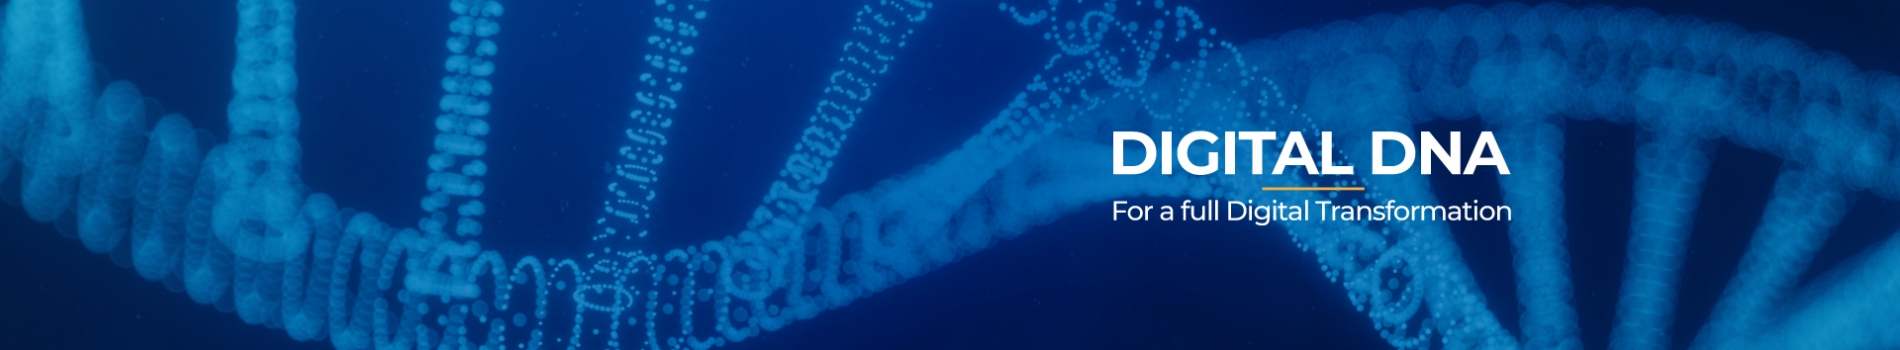 CISCO & FILIPPETTI Digital LAB for Industry 4.0